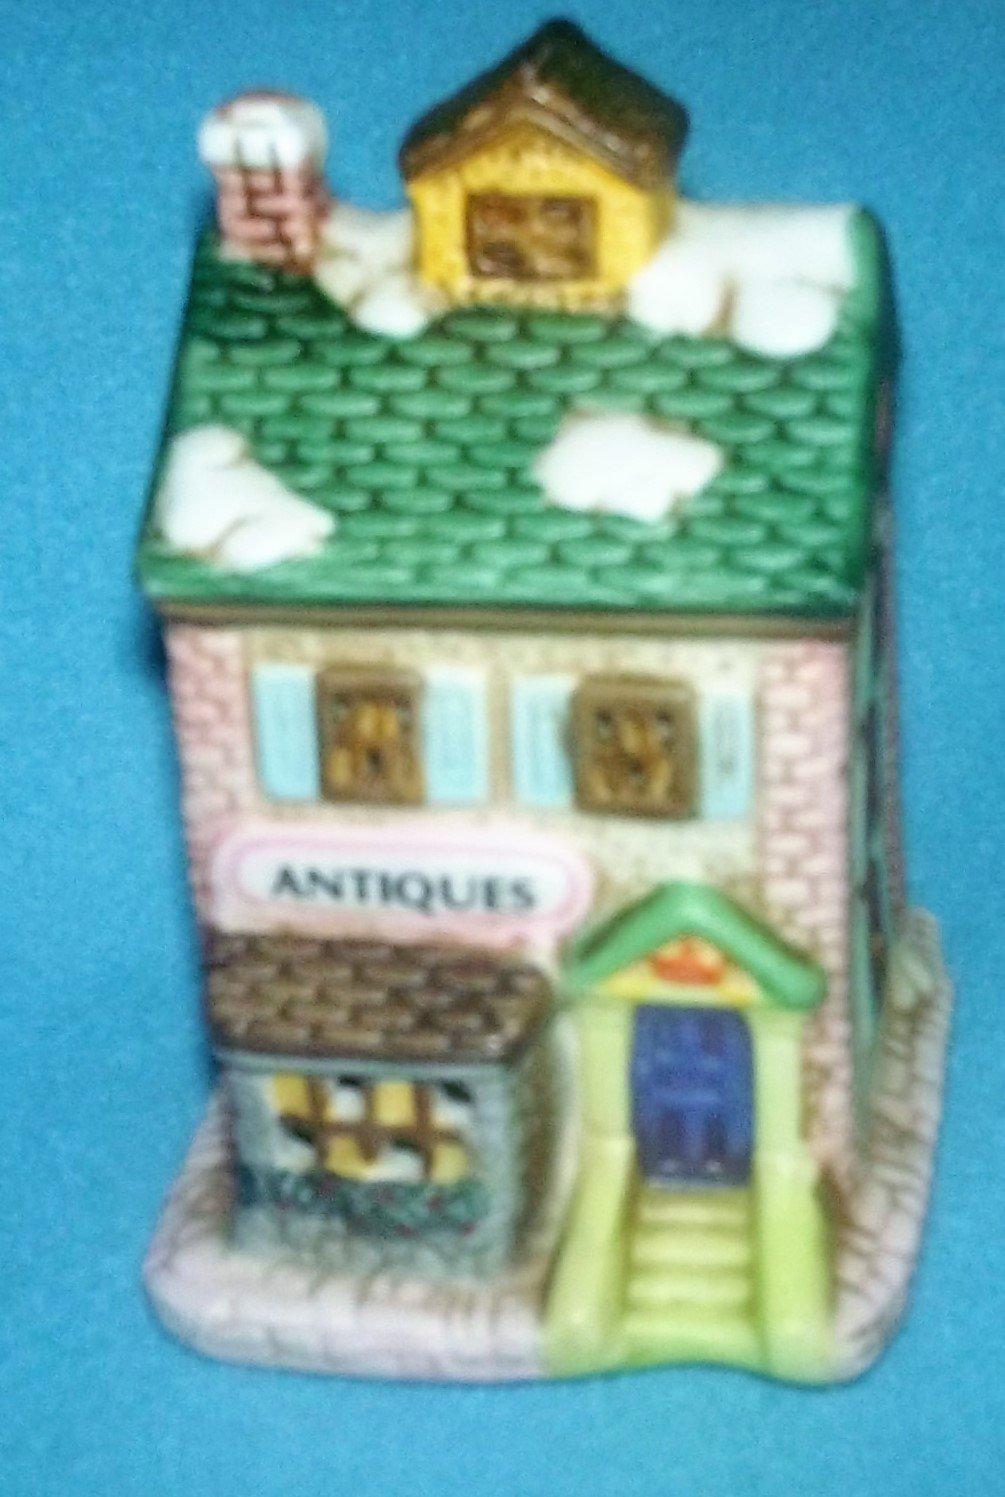 Vintage 1993 HOME TOWN AMERICA Christmas Village ANTIQUES STORE Mini Building